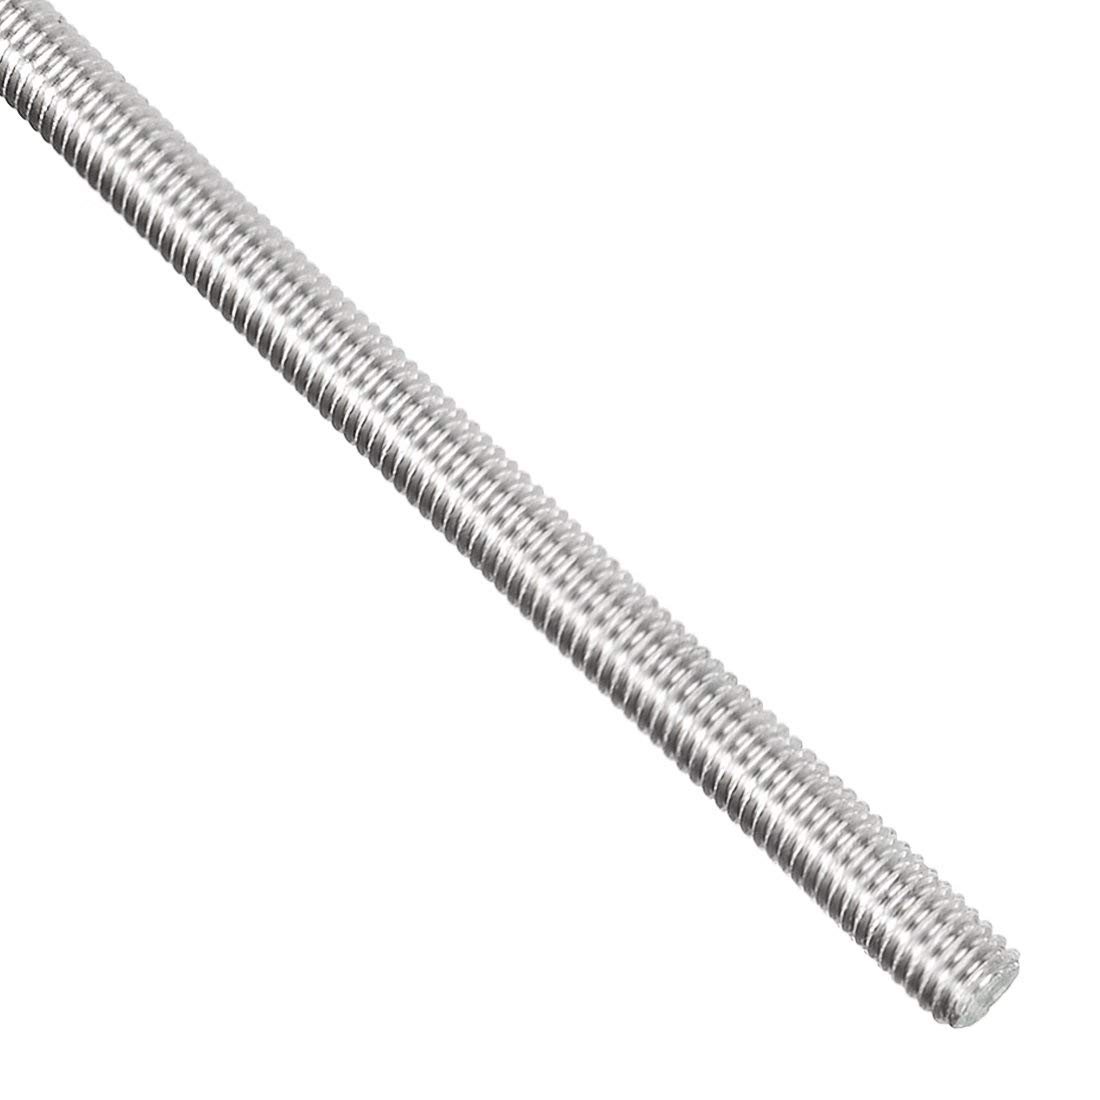 1//4-28 x 339; Plain 304 Stainless Steel Threaded Rod